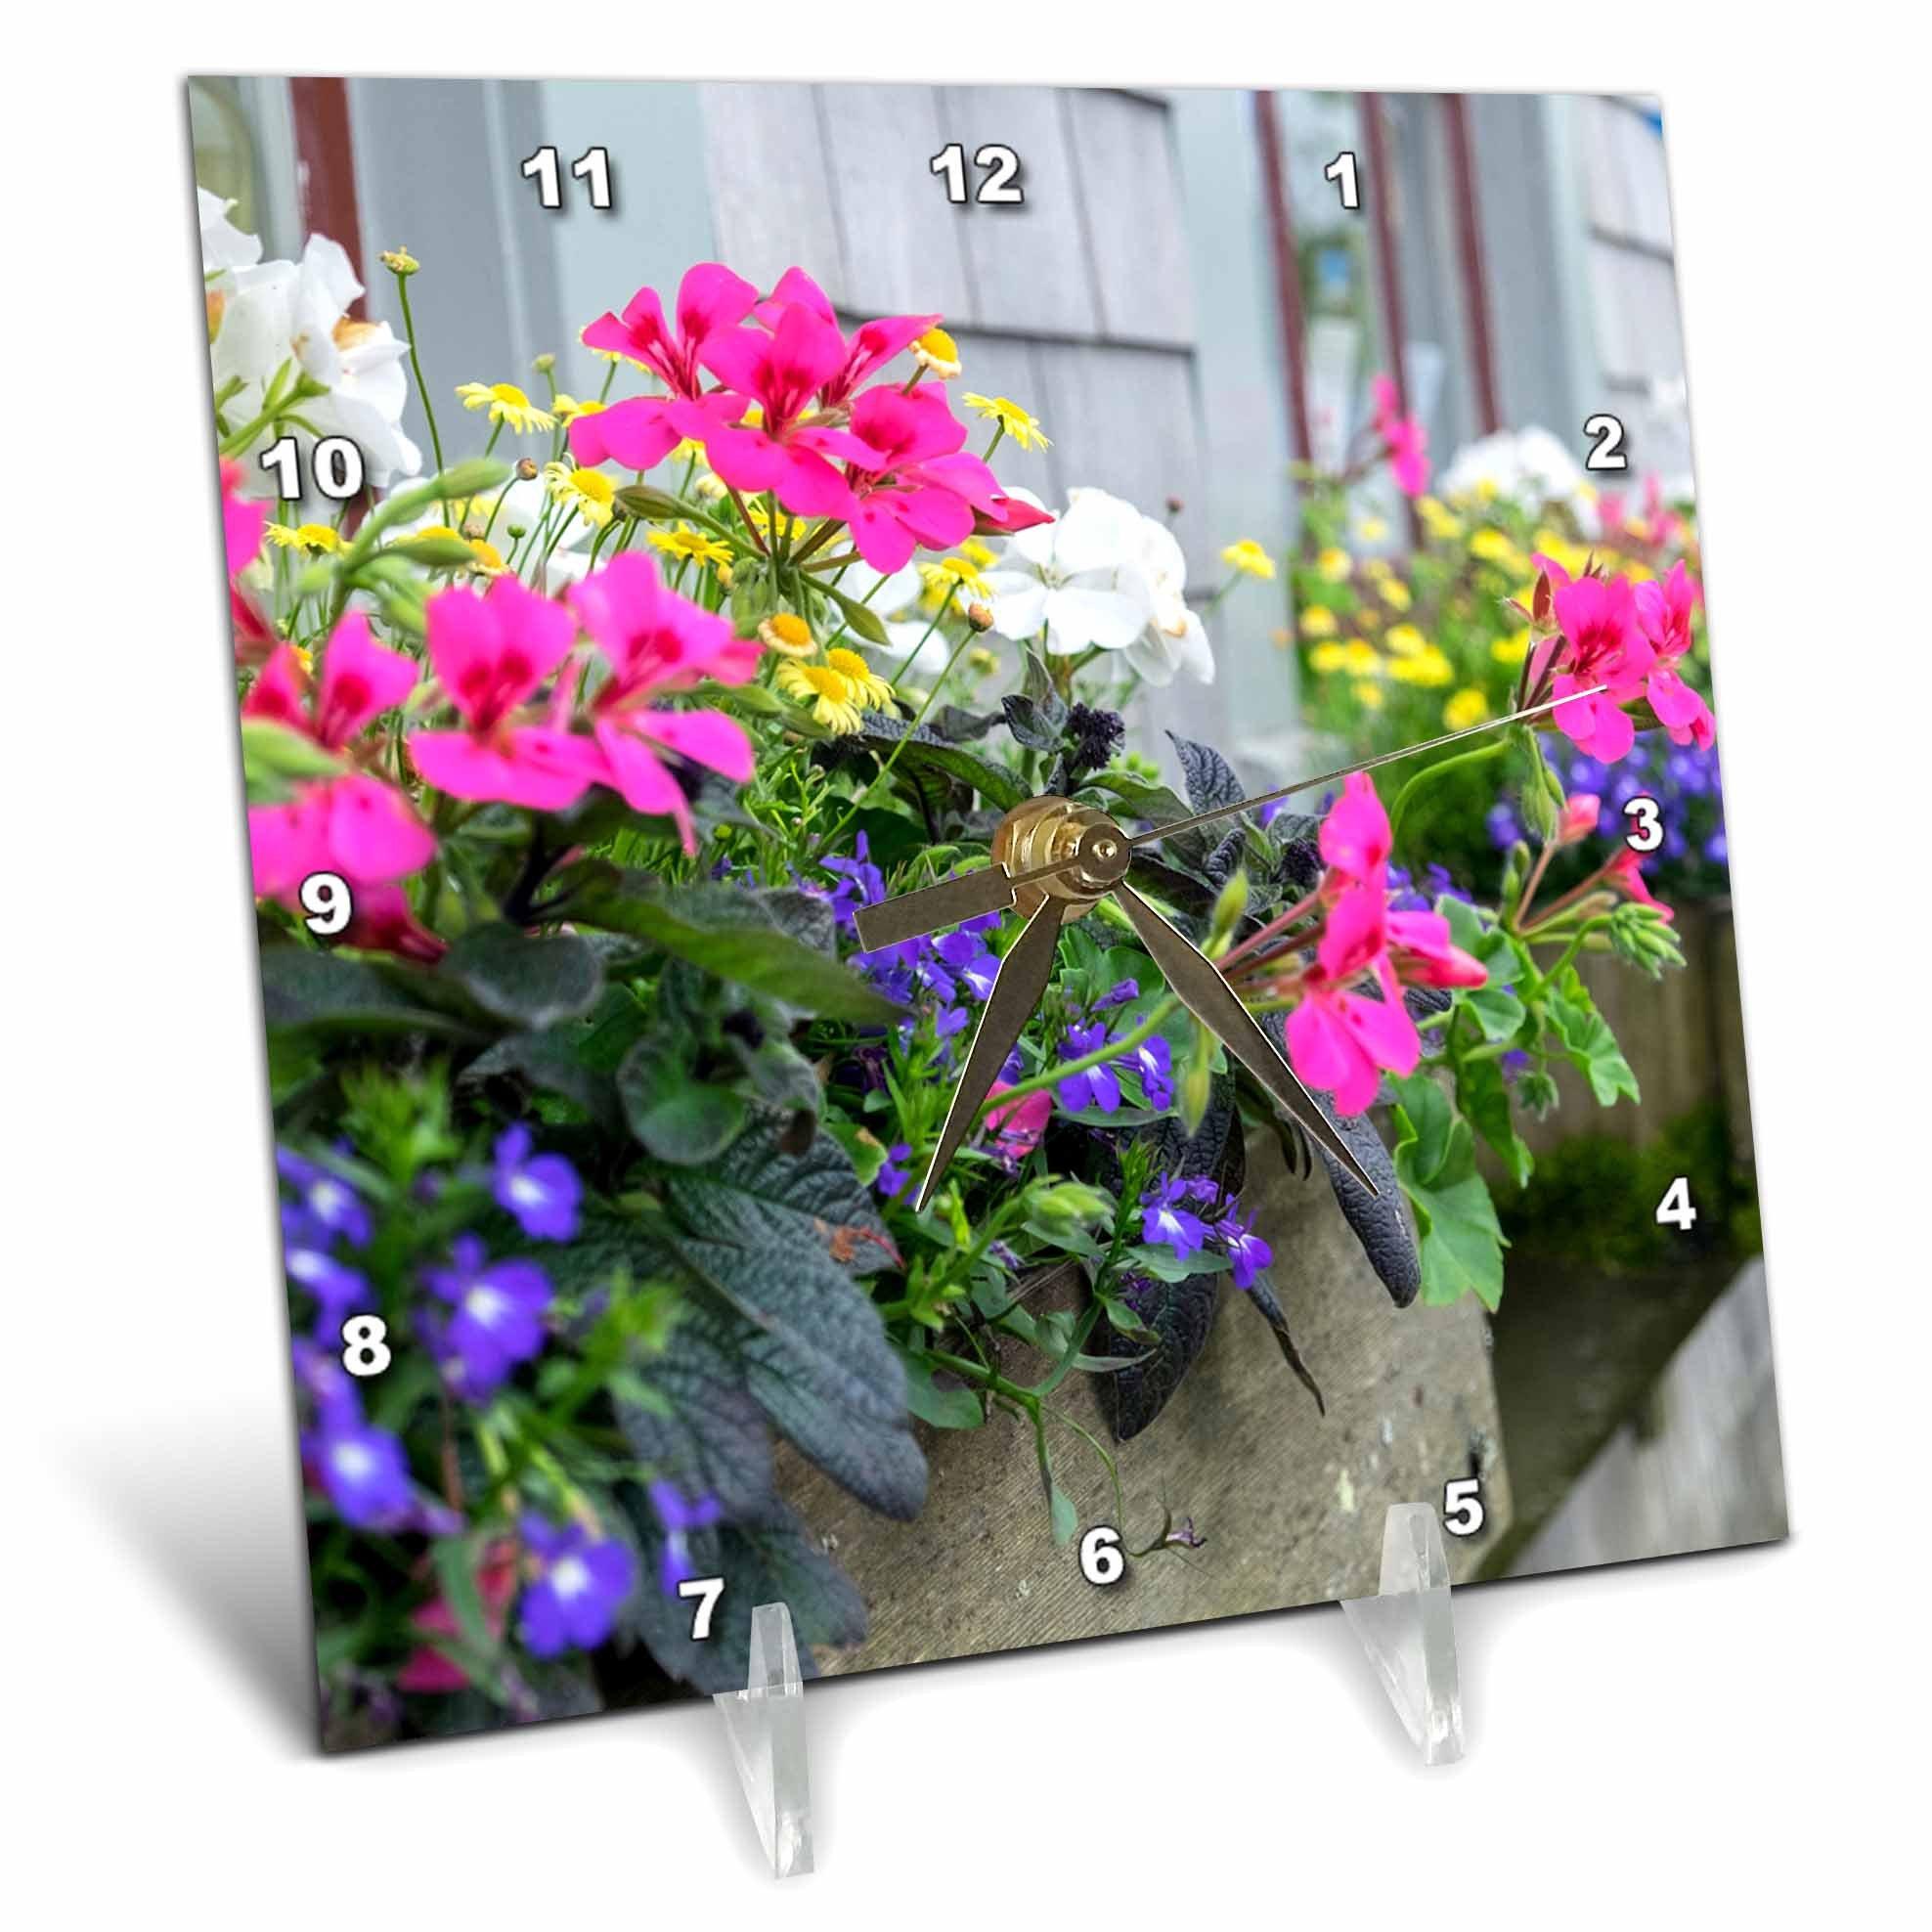 3dRose Danita Delimont - Flowers - Flowers in window boxes, Nantucket, Massachusetts, USA - 6x6 Desk Clock (dc_279042_1)